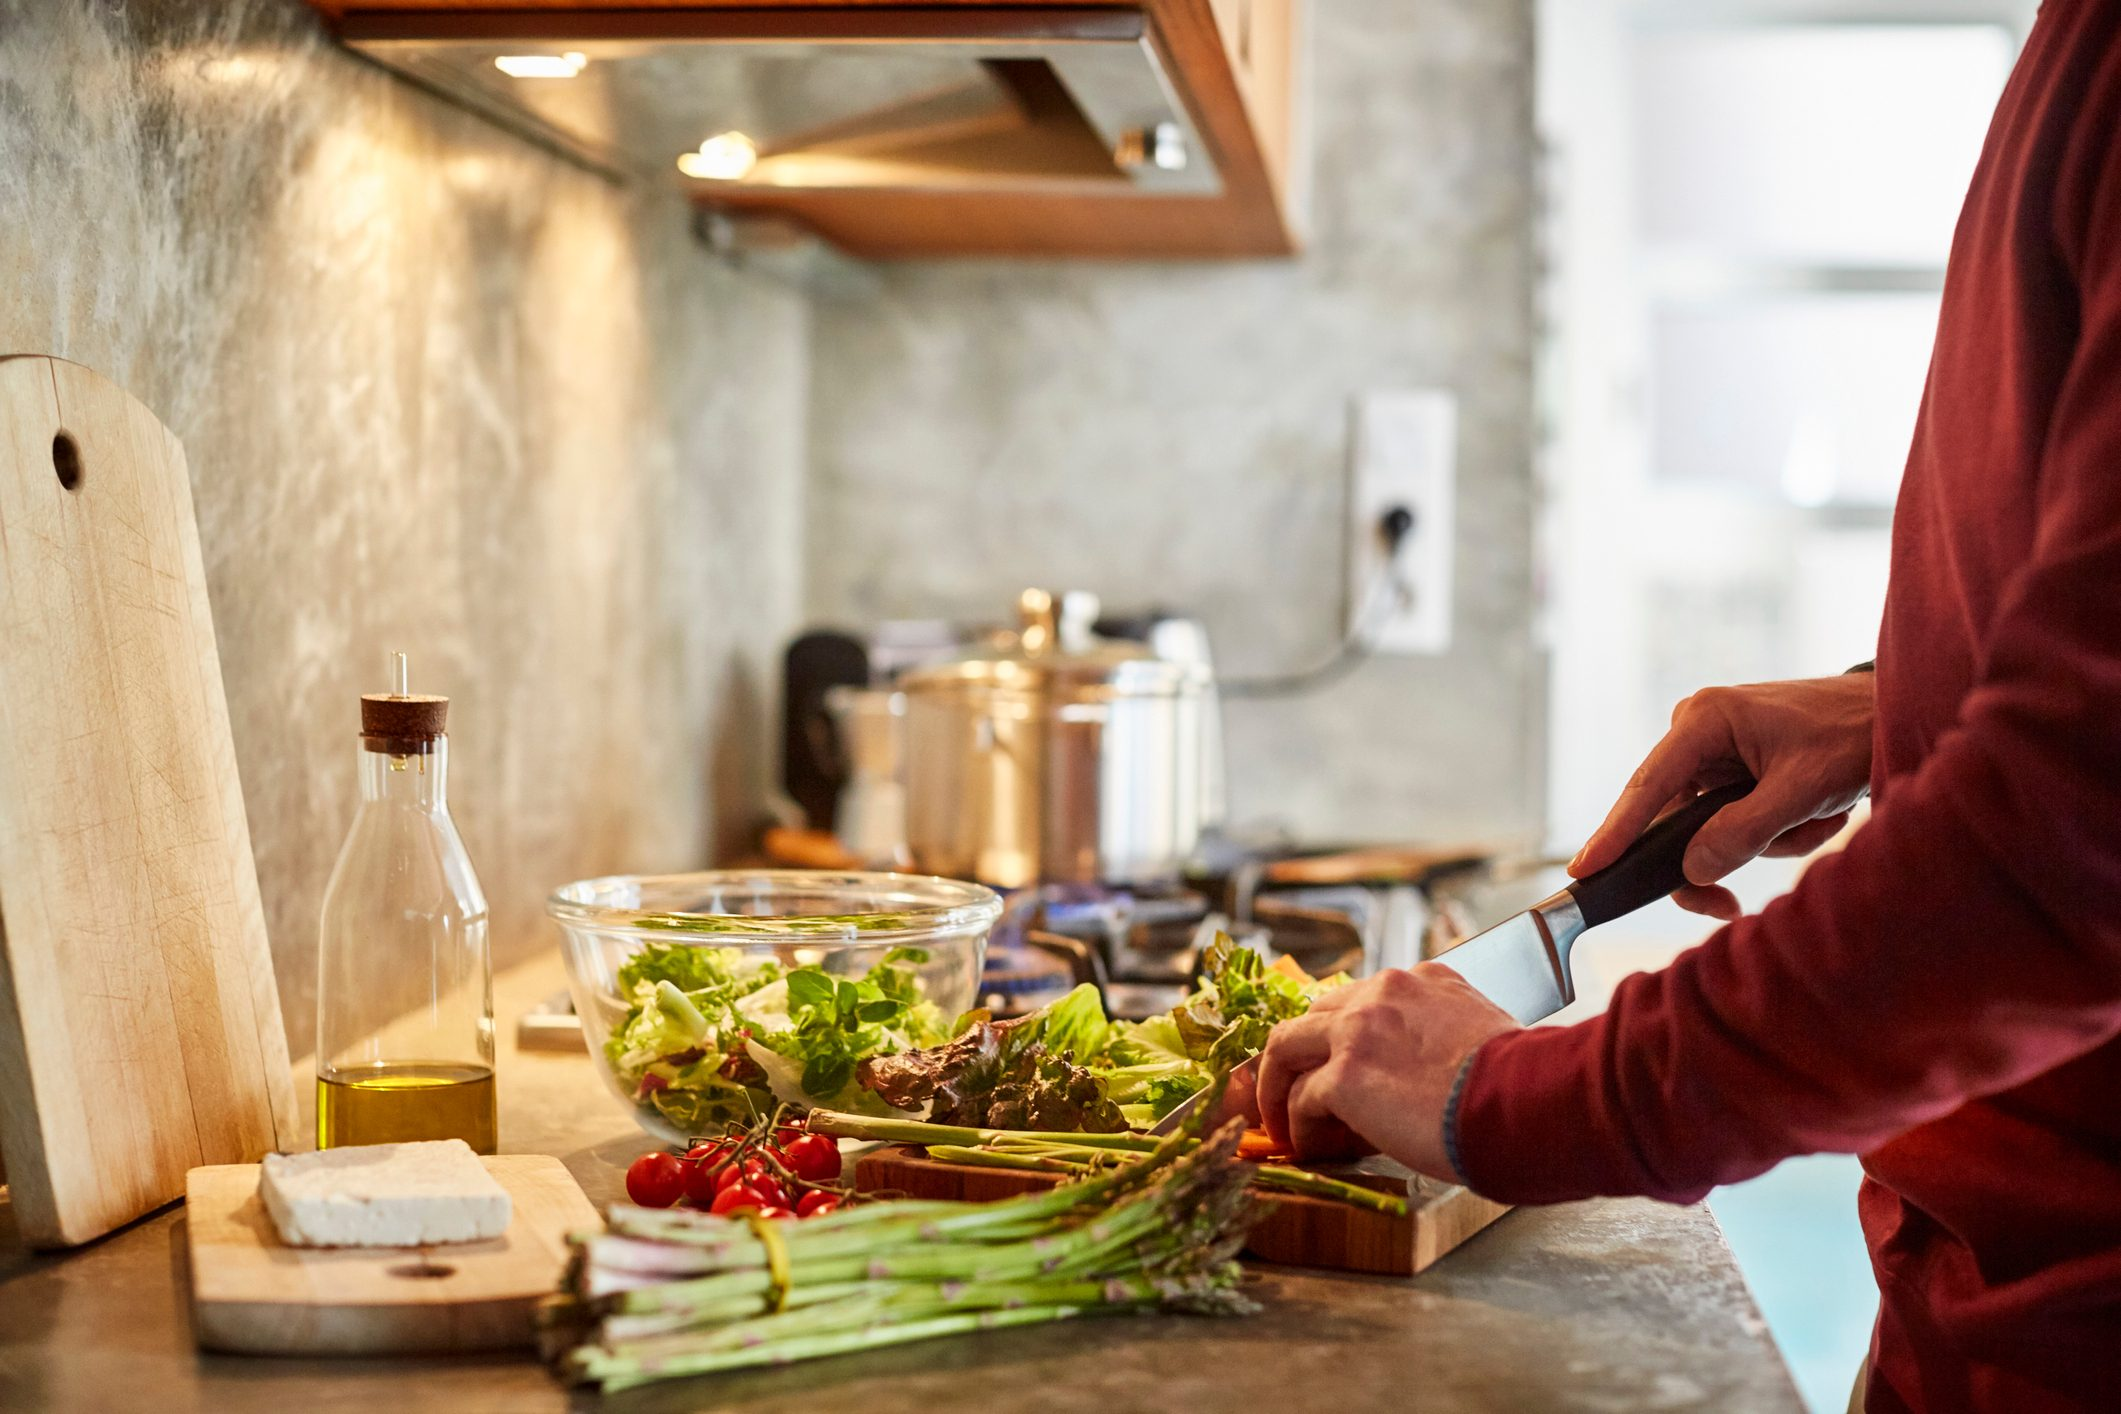 man preparing a healthy meal